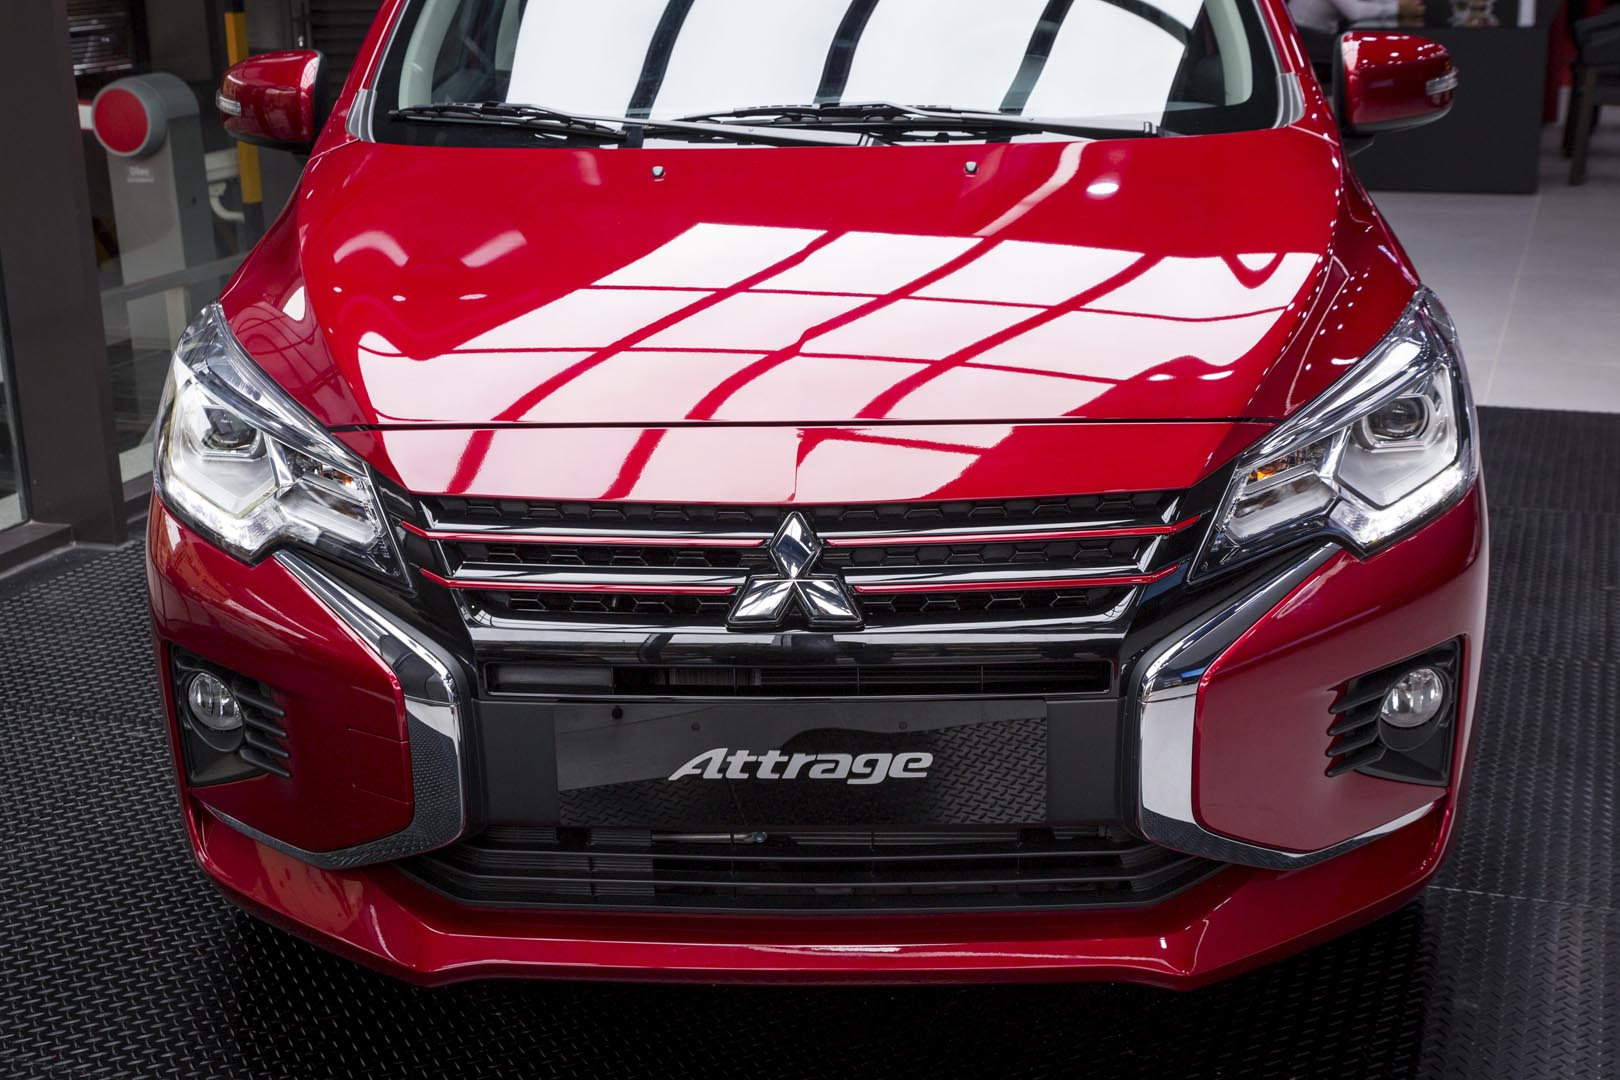 Thiết kế Dynamic Shield trên Mitsubishi Attrage 2020